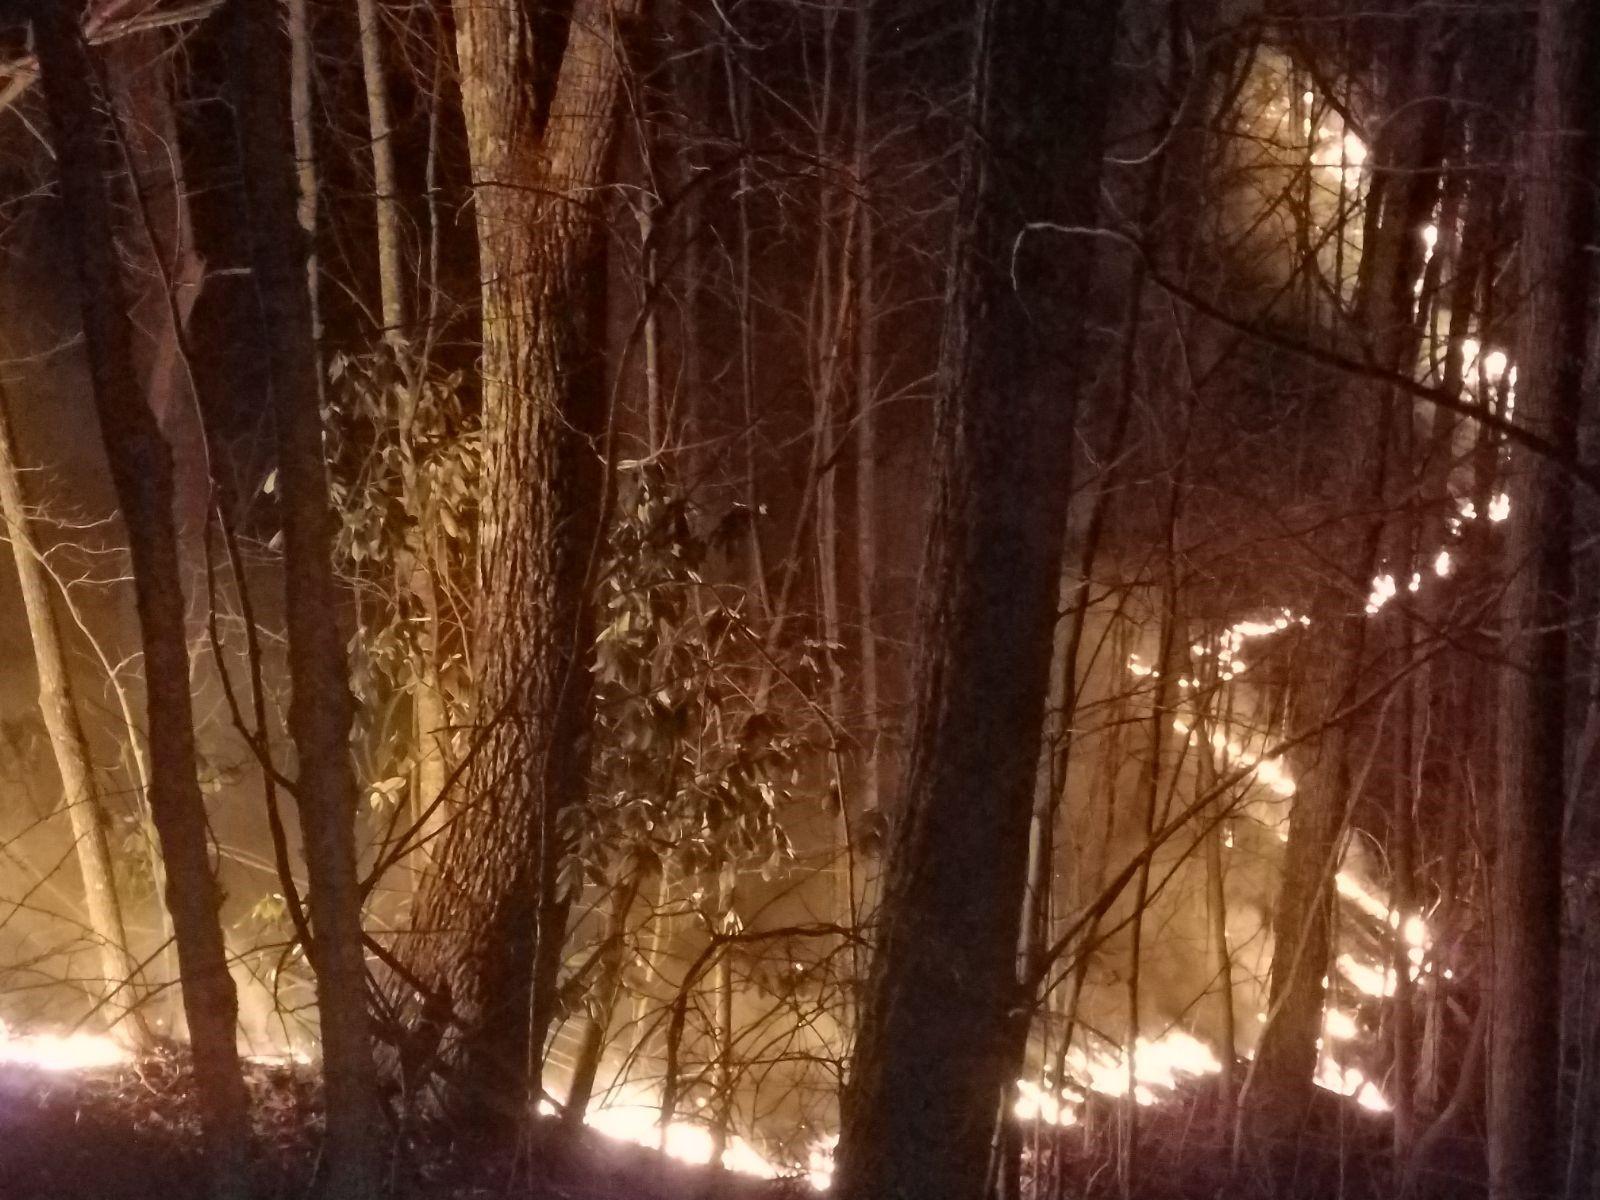 smyth forest fire 2_1553526775952.jpg.jpg